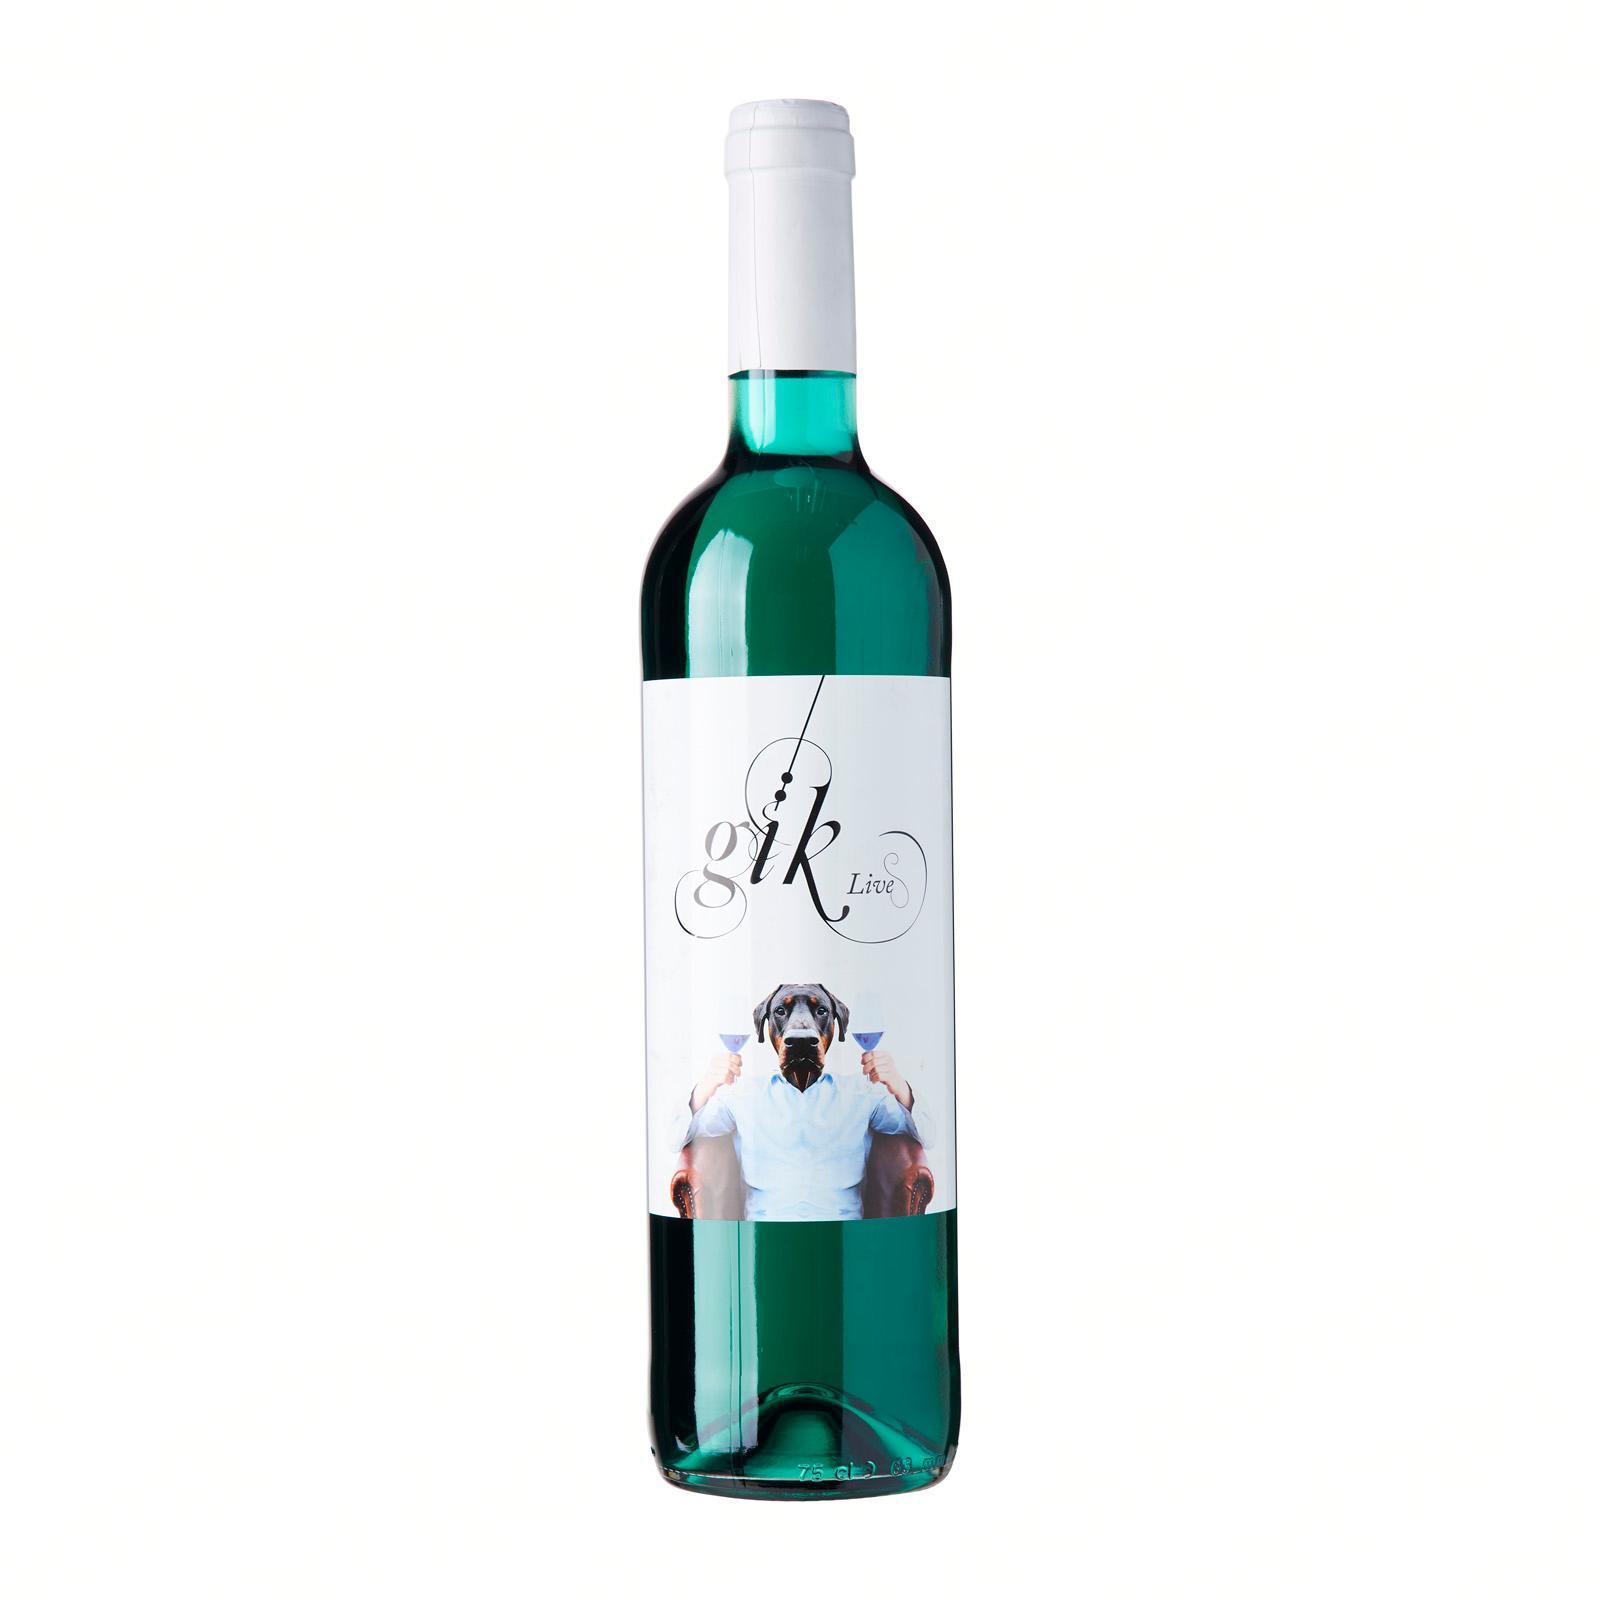 Gik Blue Wine - By The Liquor Shop Singapore